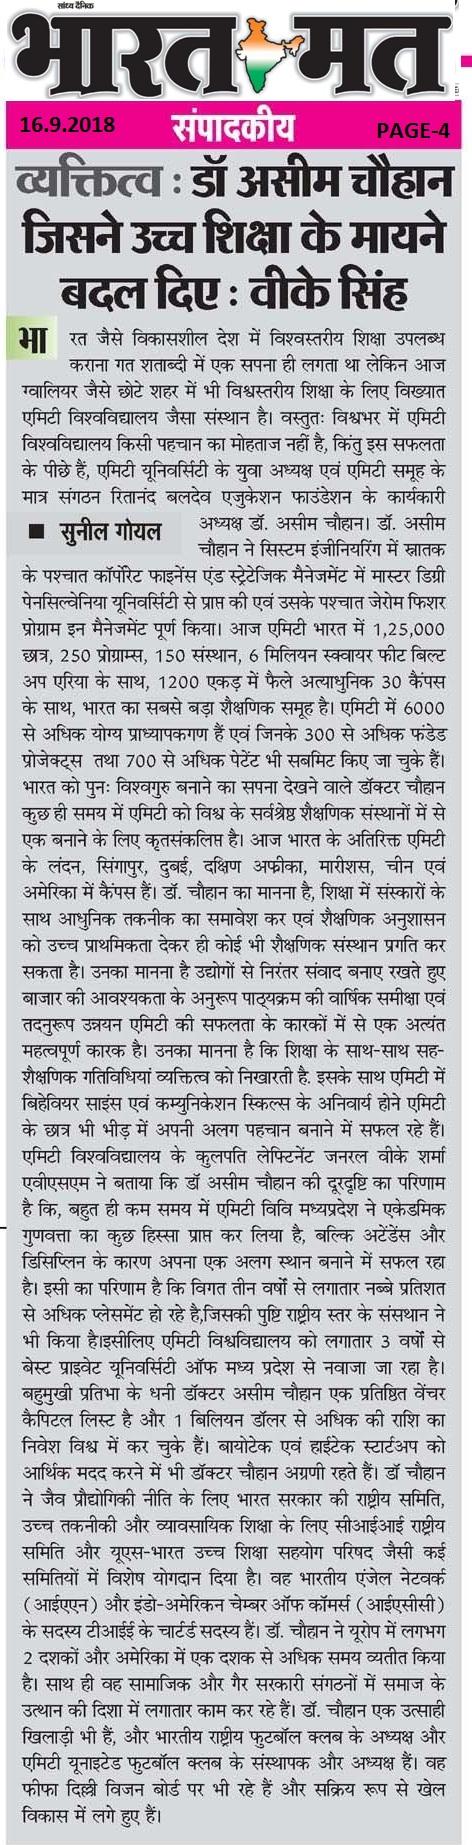 BharatMat-16.9.2018-AUMP-Editorial on 8th Raising Day-2018-Amity